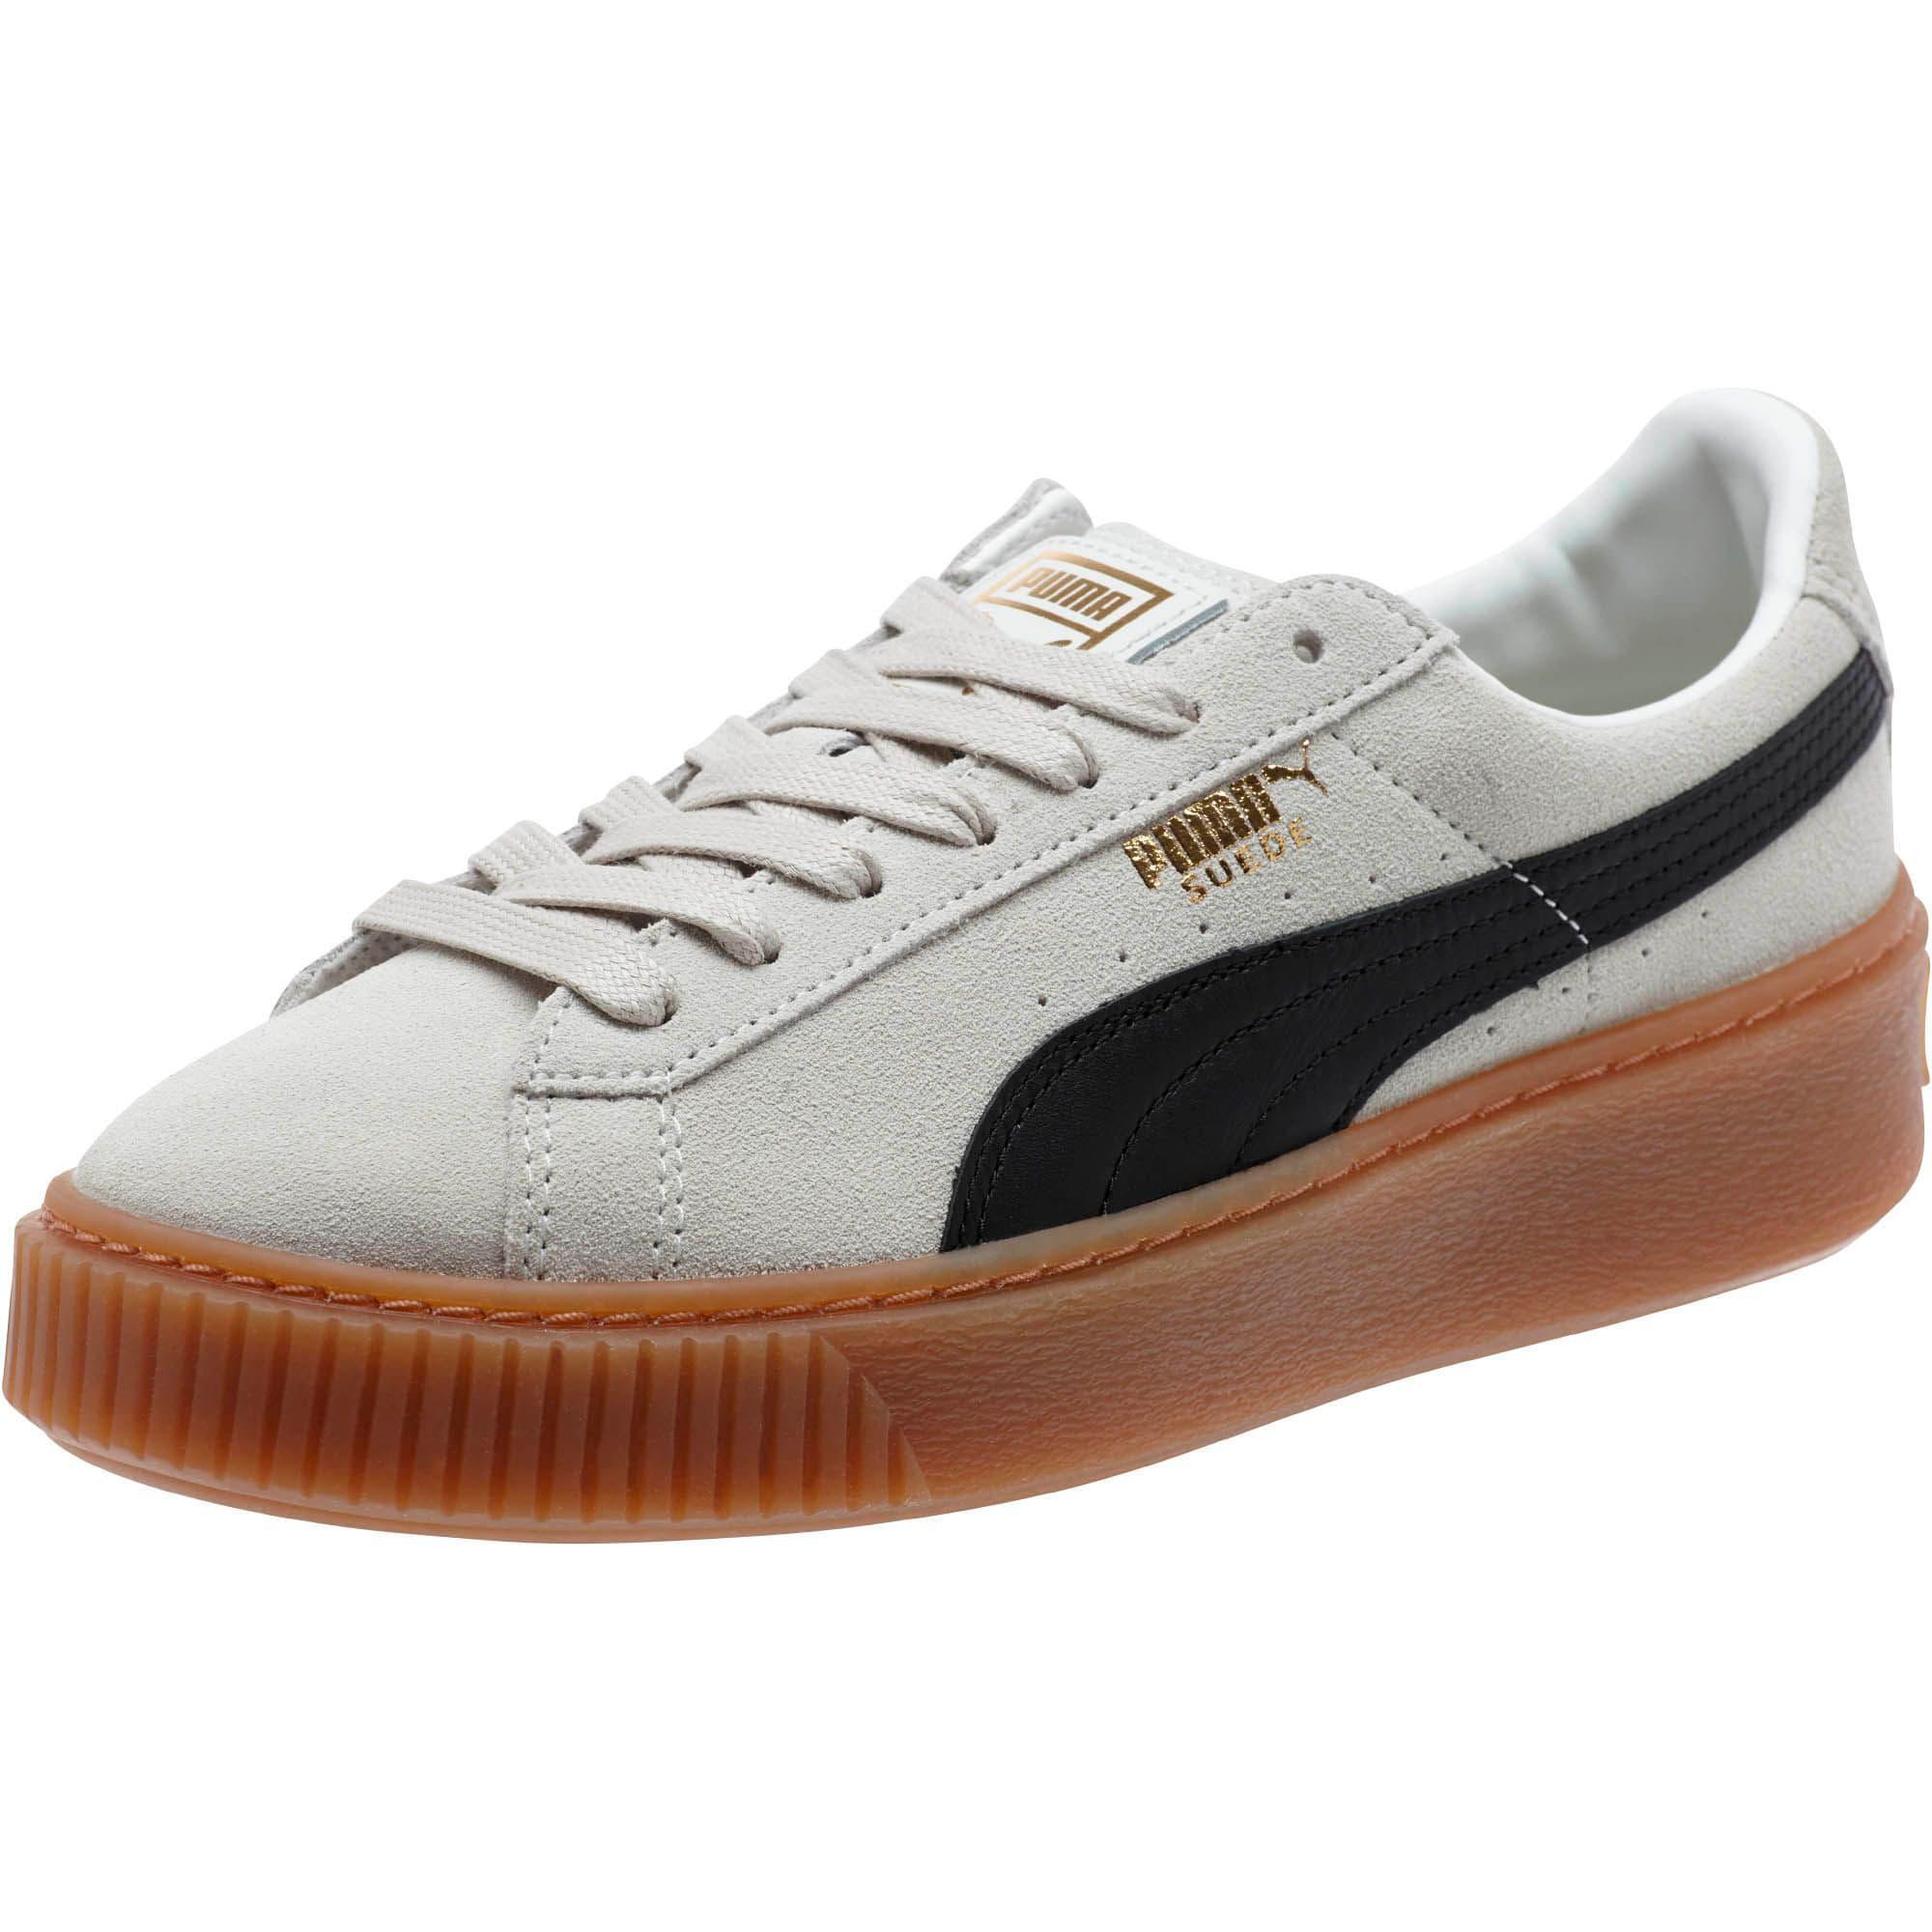 Womens Puma Suede Platform Core Low Top Sneakers Puma